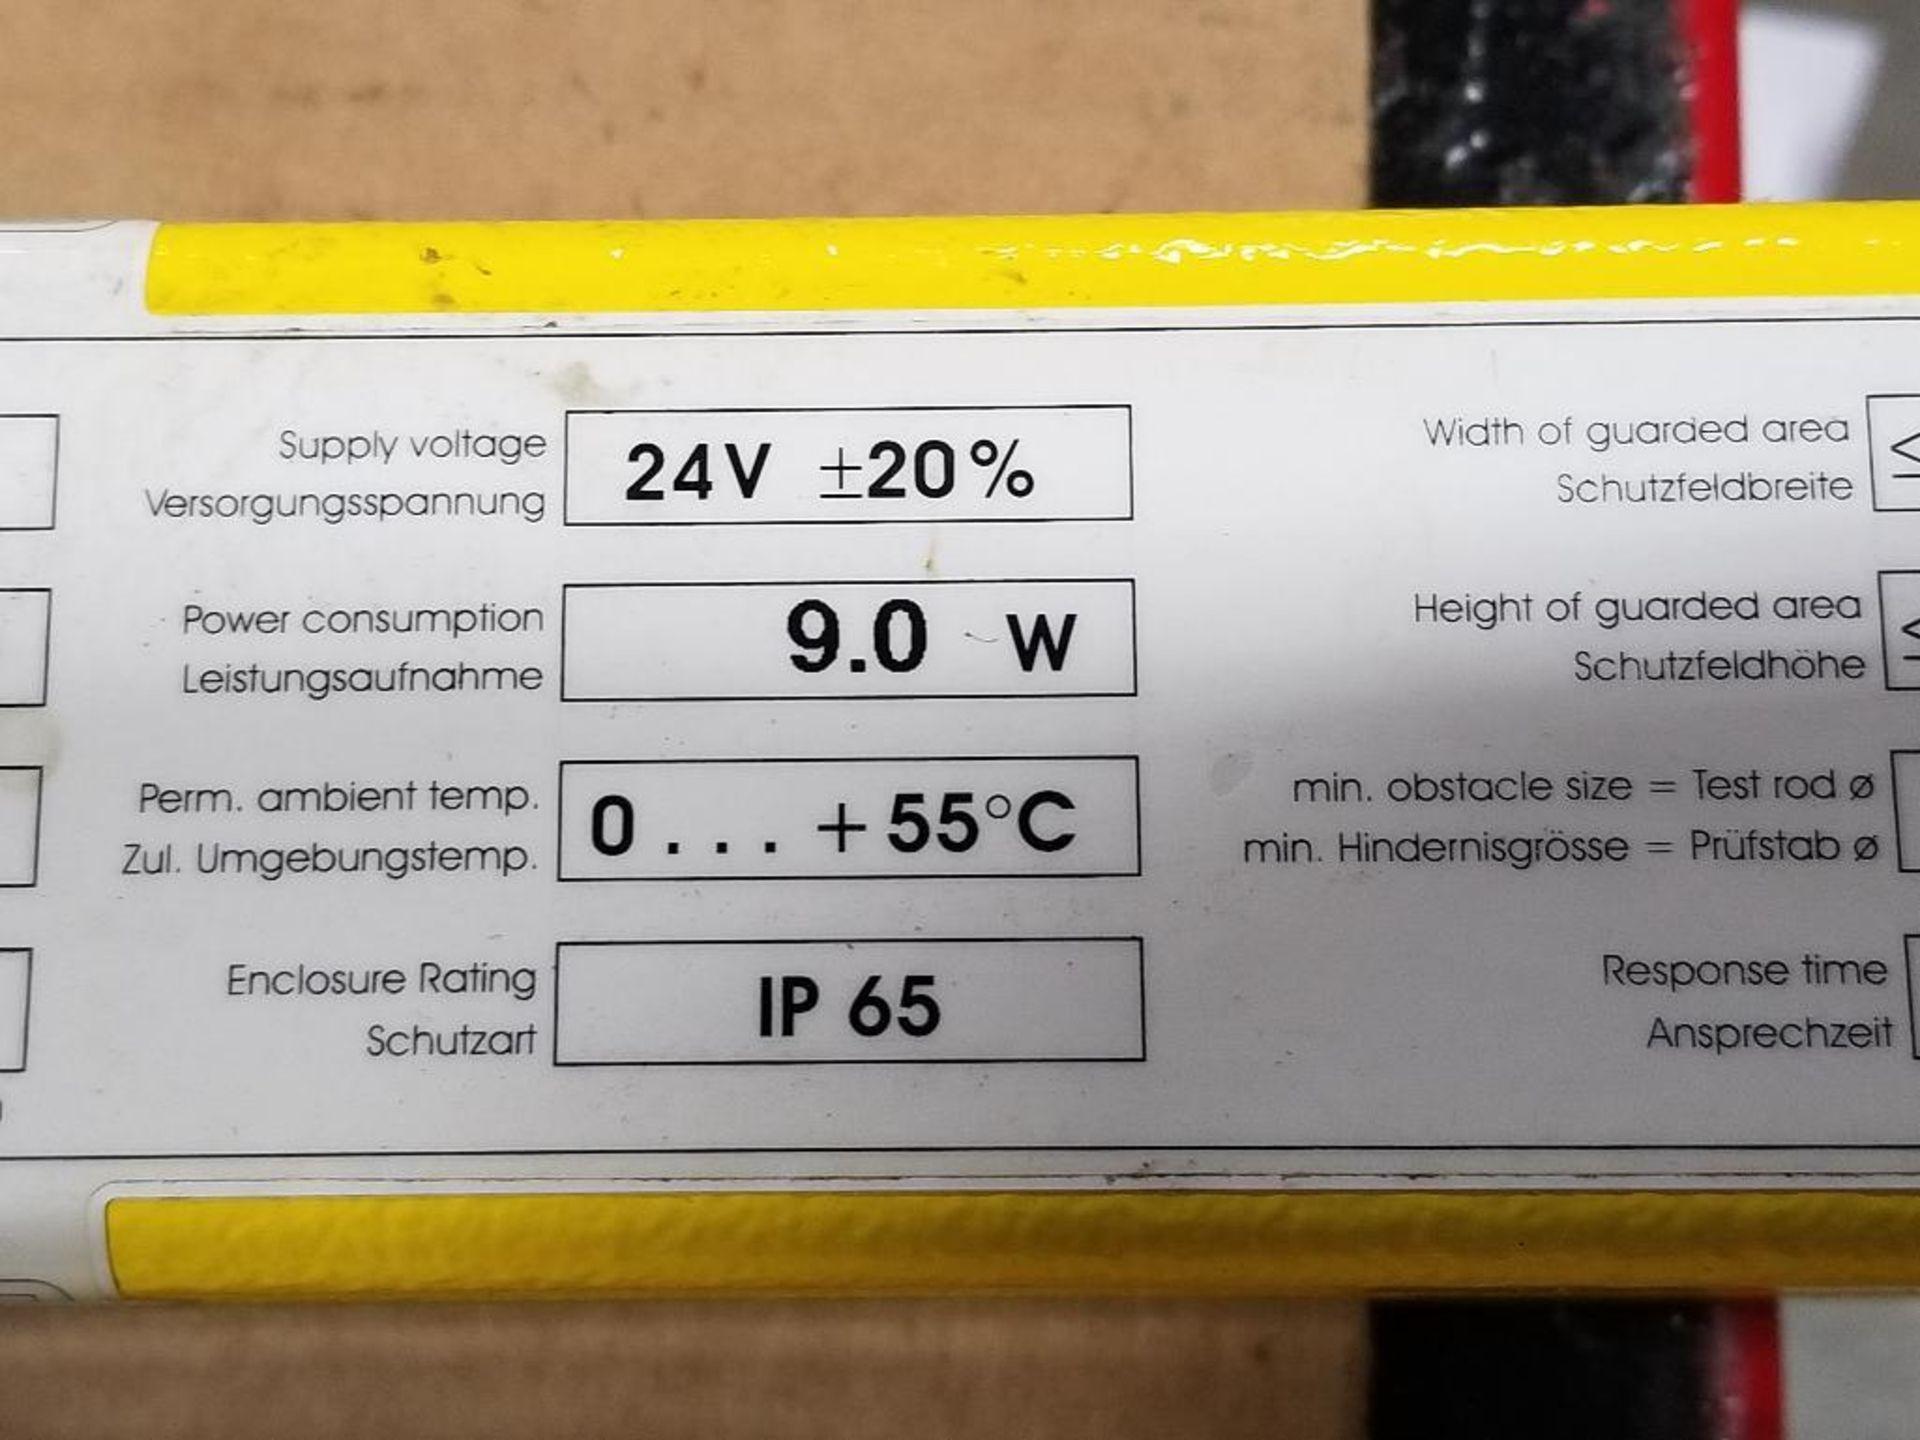 SICK Light curtain transmitter / receiver set. 14-FGS 1-012-767, 1-012-768. - Image 10 of 11